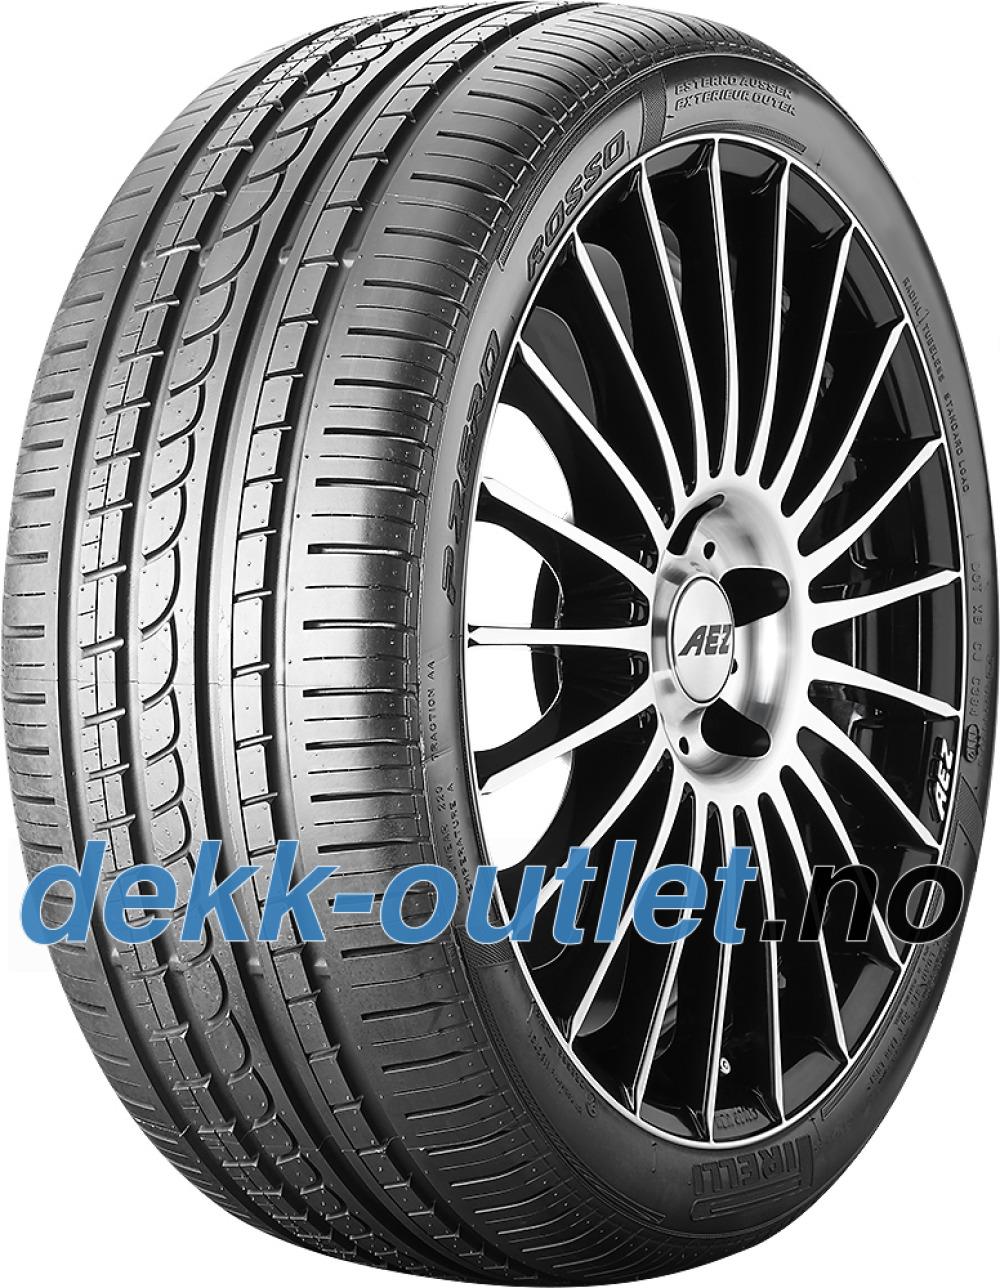 Pirelli P Zero Rosso Asimmetrico ( 315/30 ZR18 (98Y) N4, med felgbeskyttelse (MFS) )